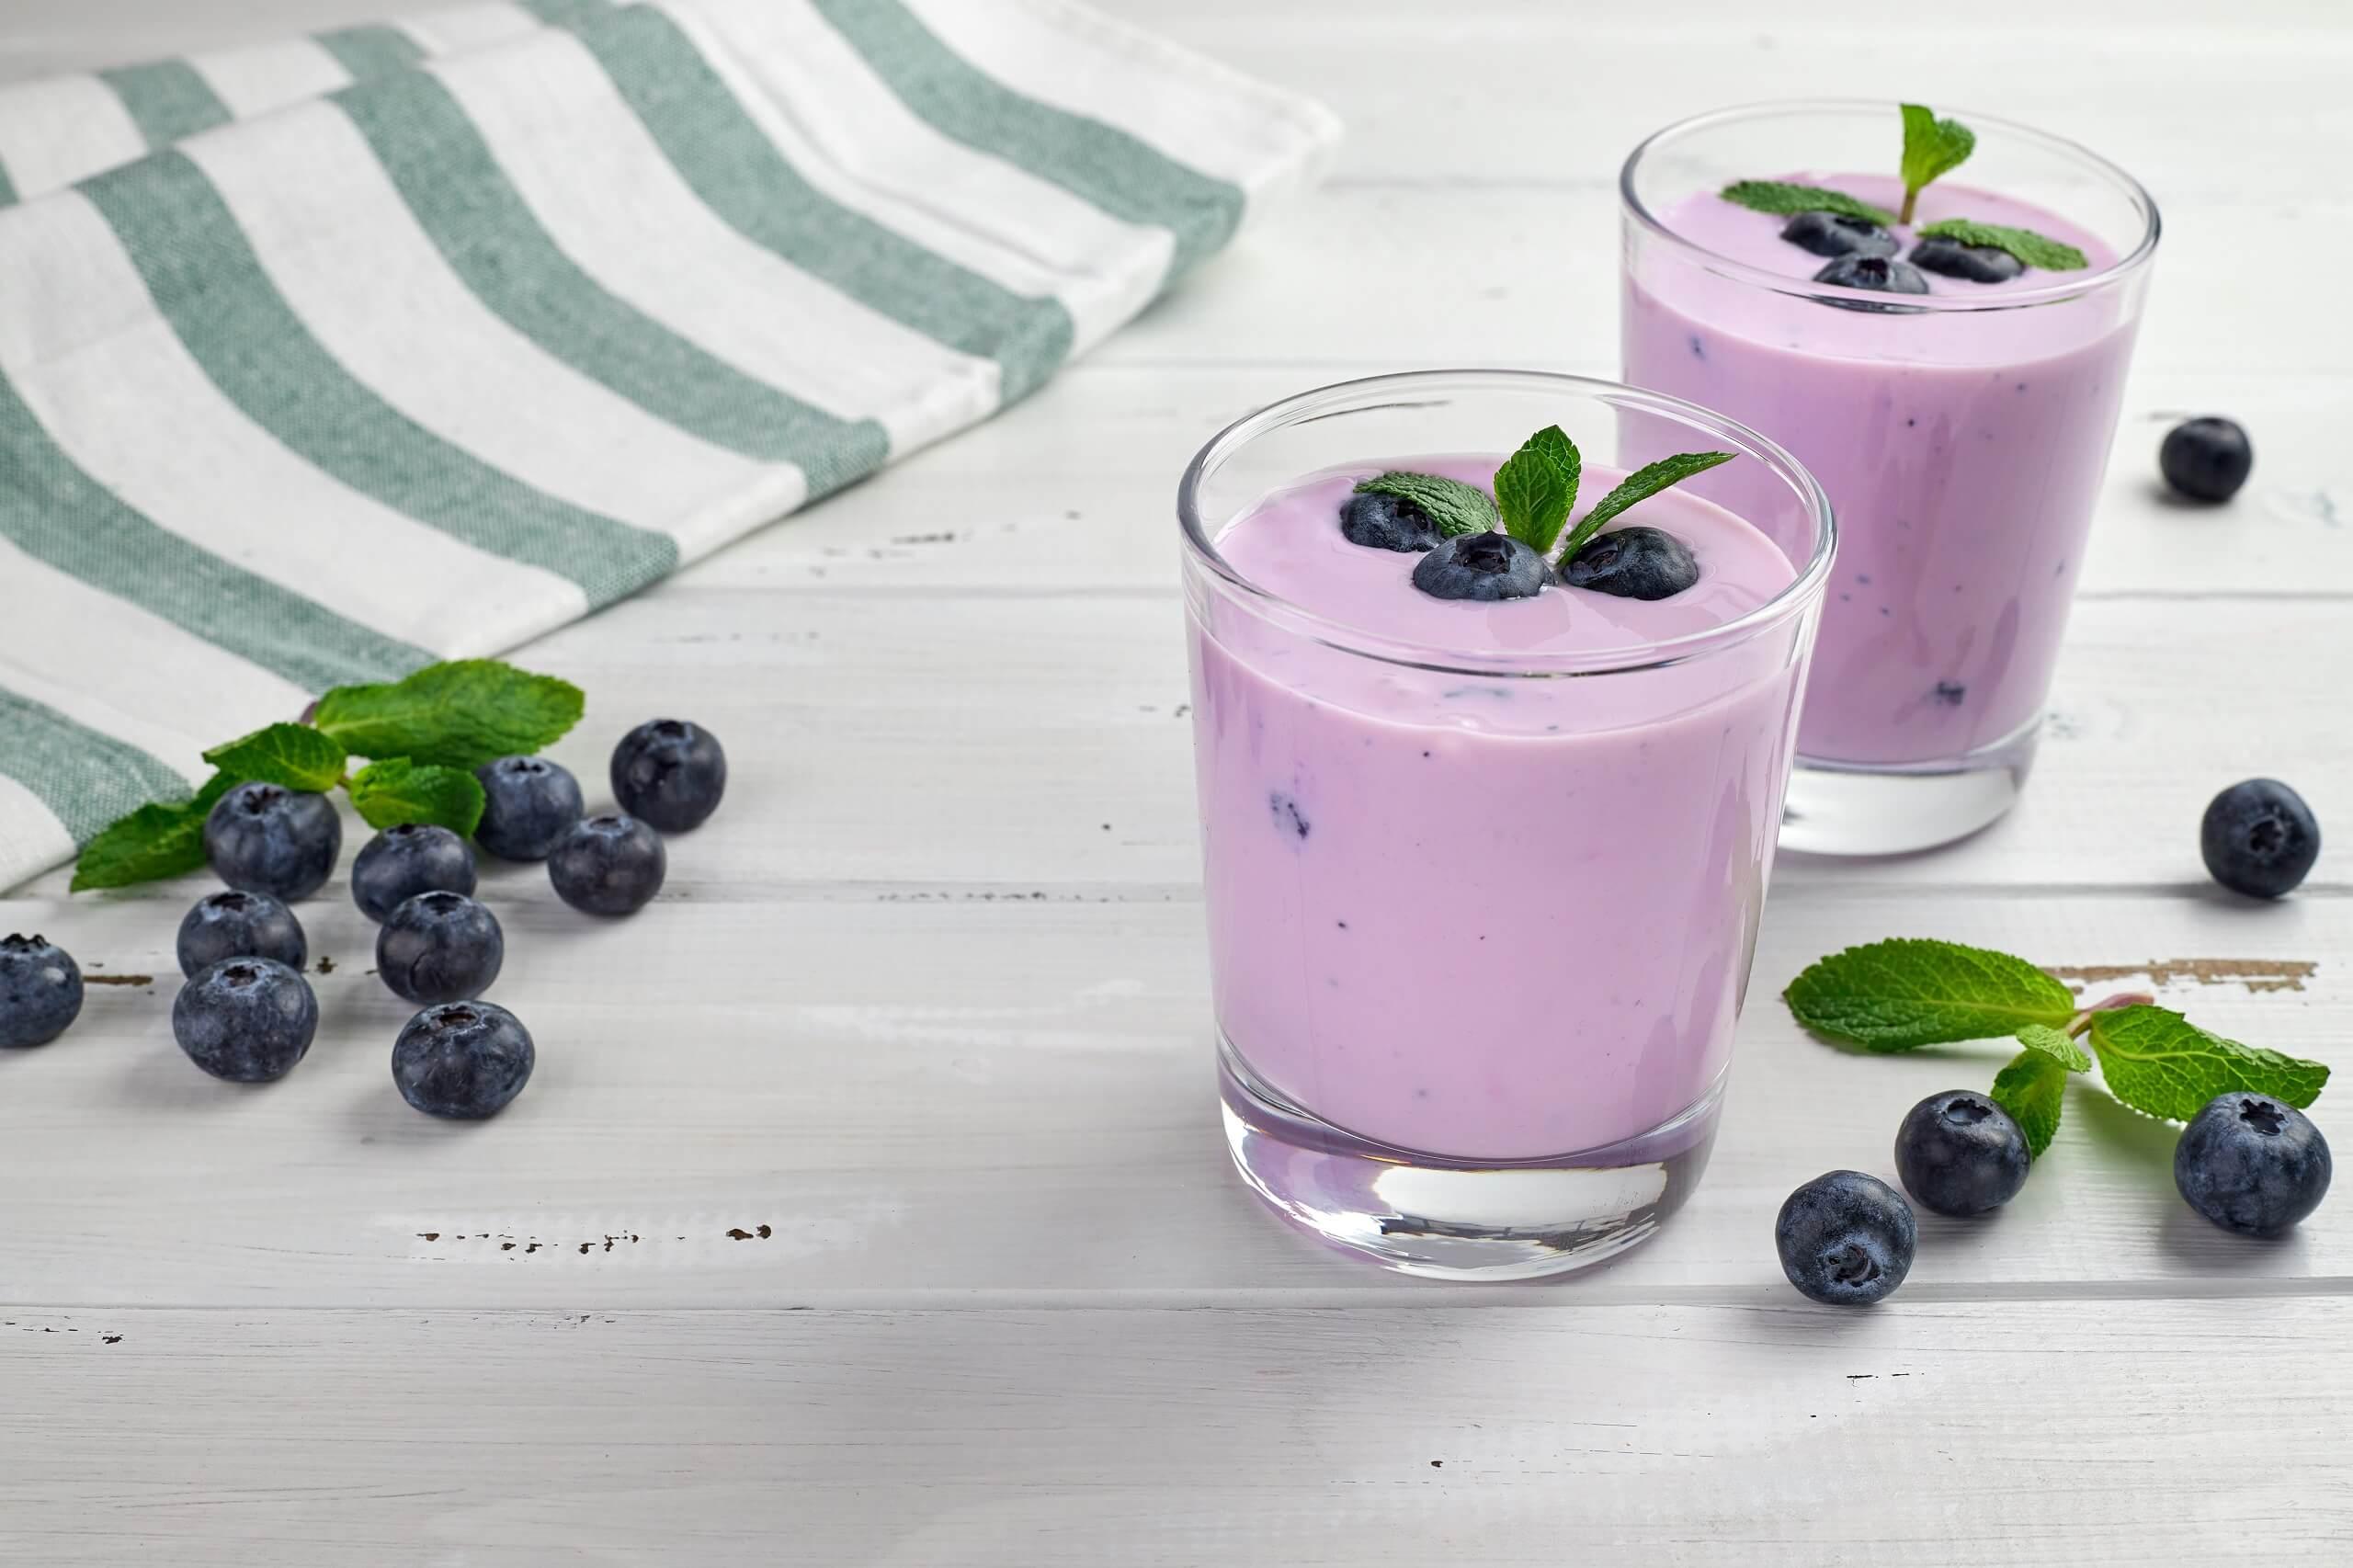 blueberry-yogurt-served-with-fresh-blueberries-mint-leaves-two-glasses-yogurt-white-wooden-table-healthy-breakfast